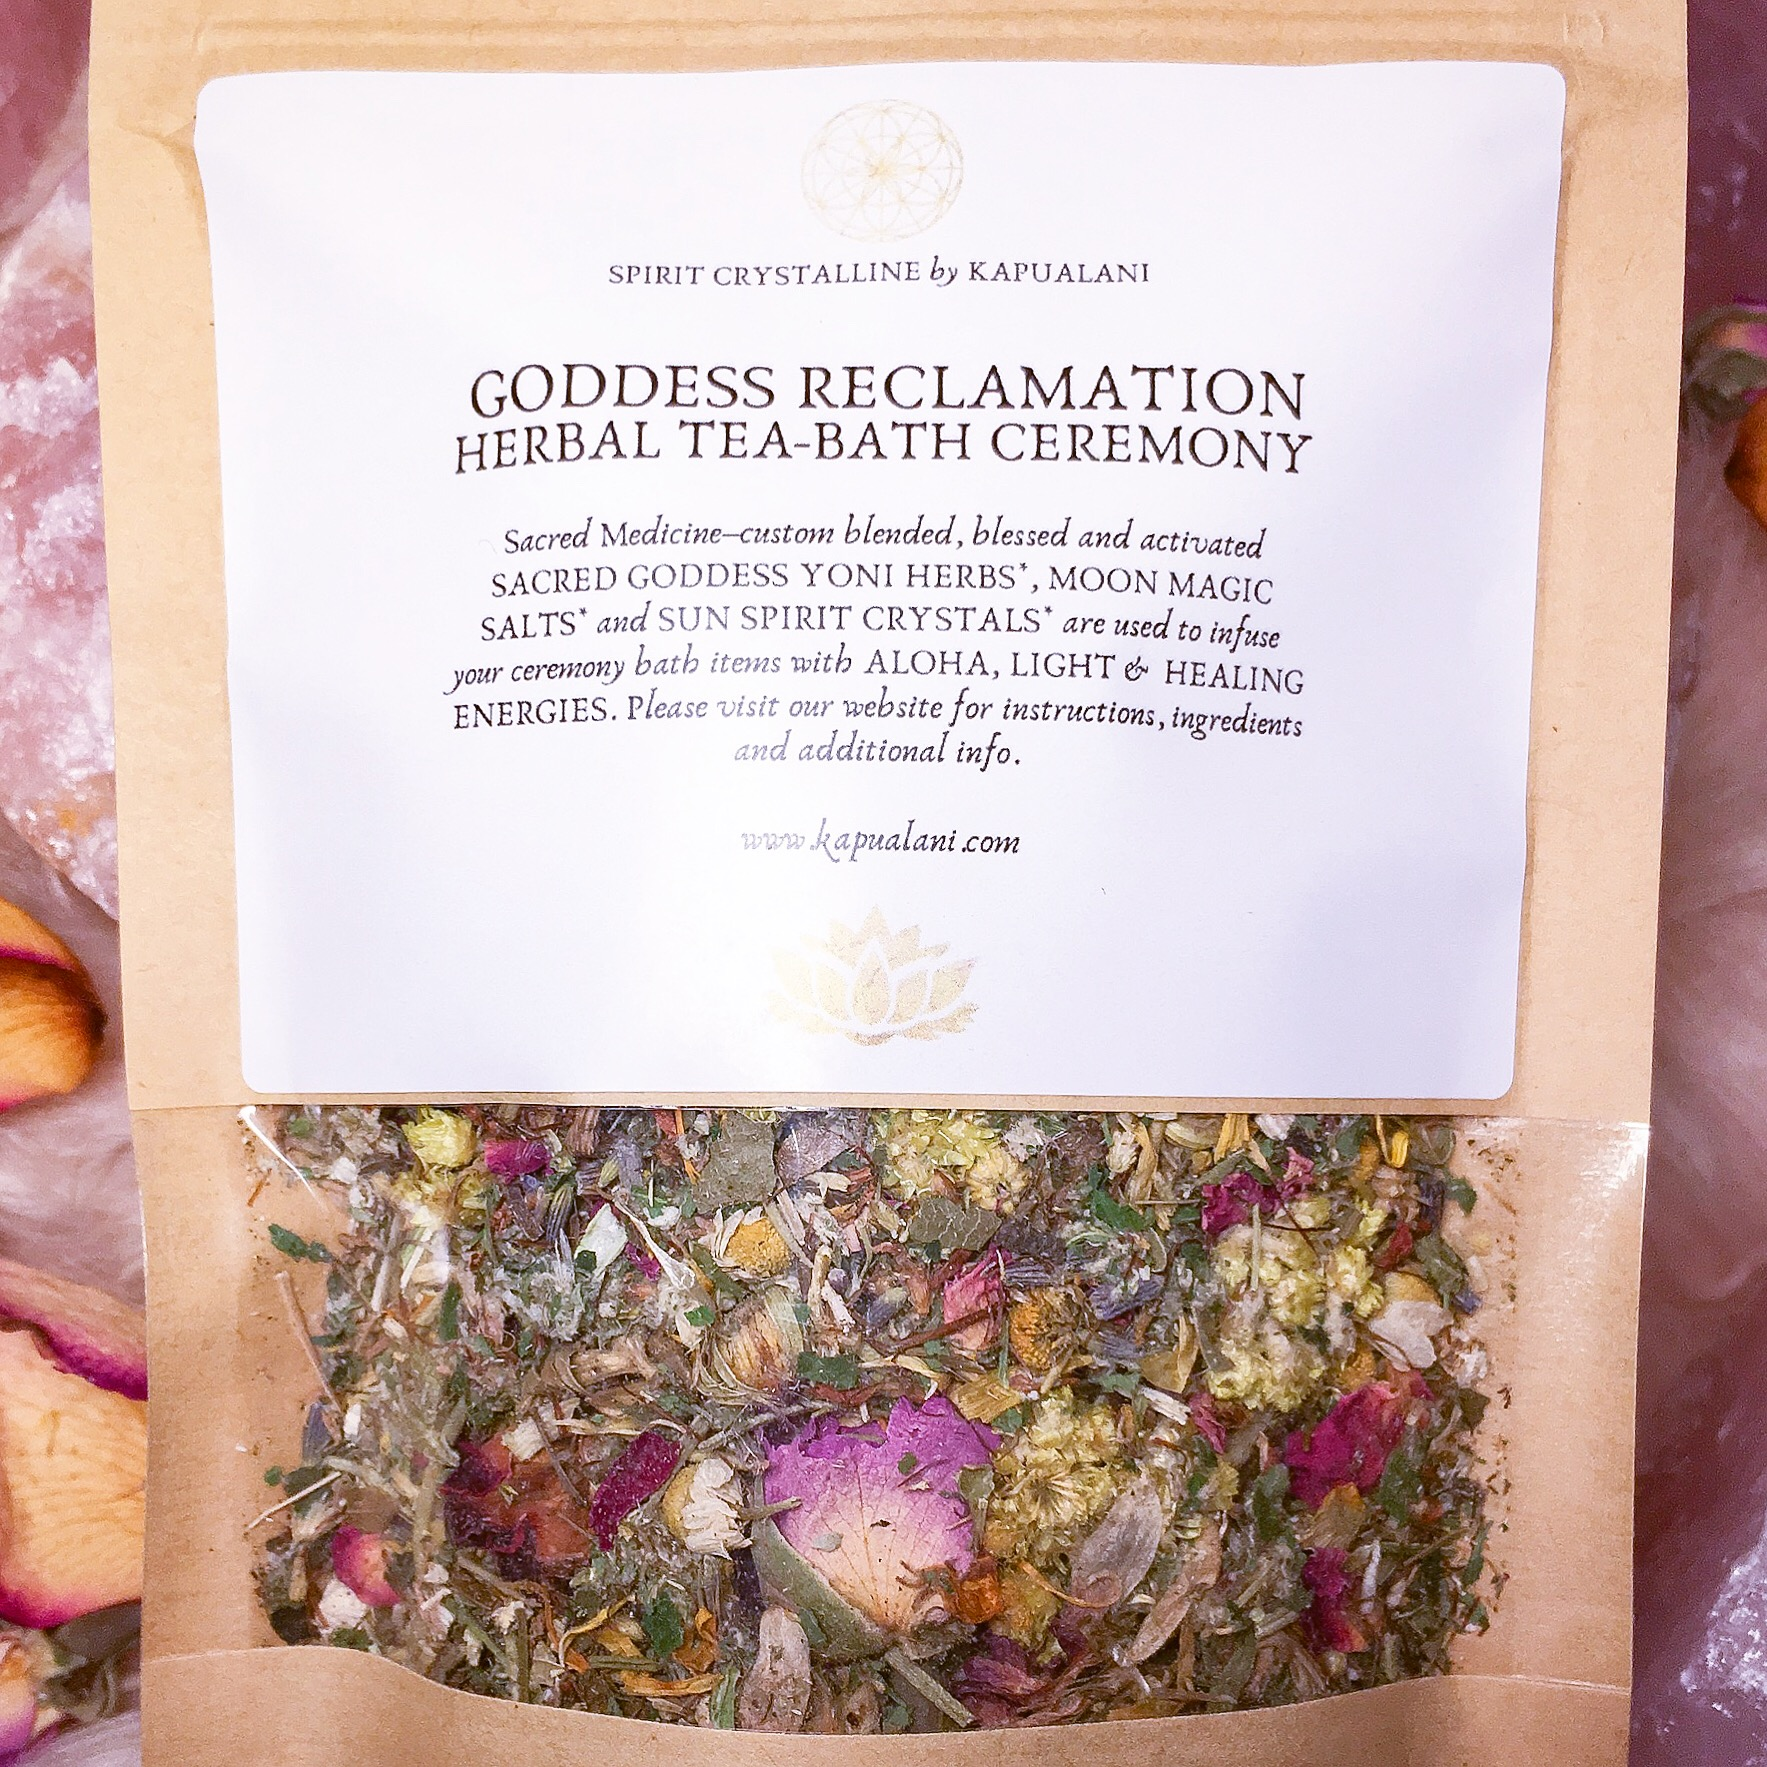 Goddess Reclamation Ceremony Kit